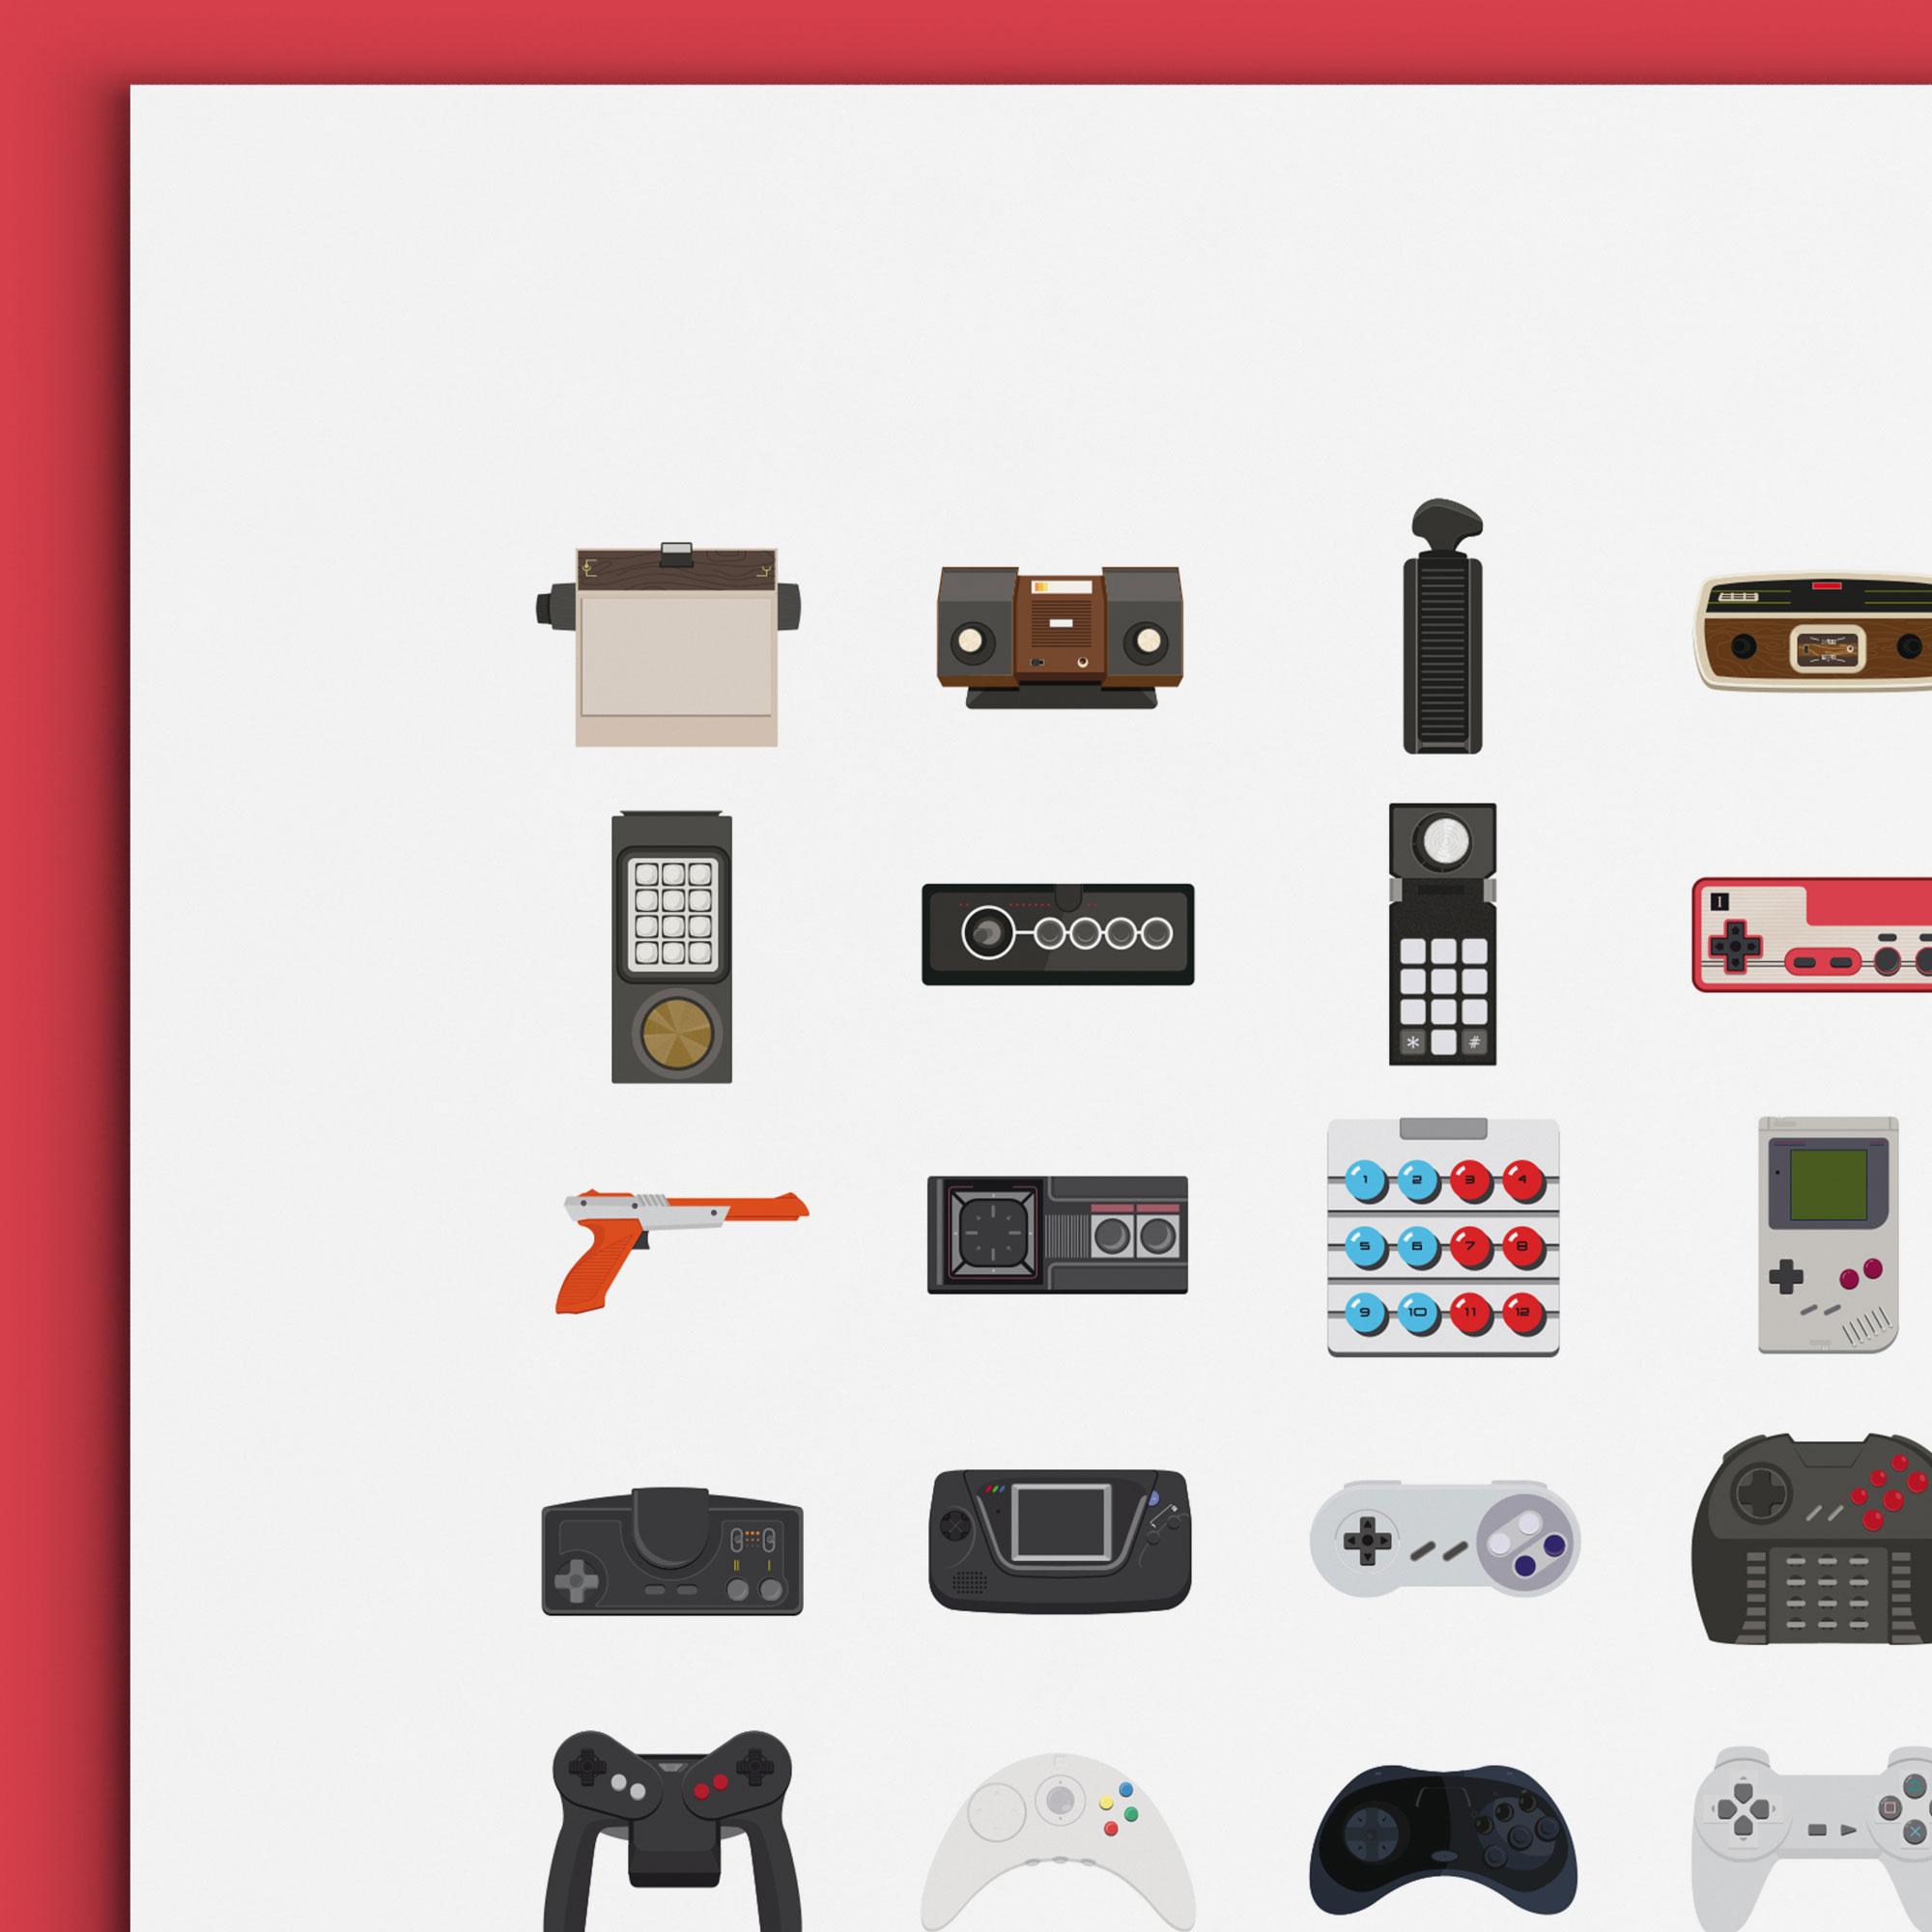 Product-Shot-Mockup-3.jpg